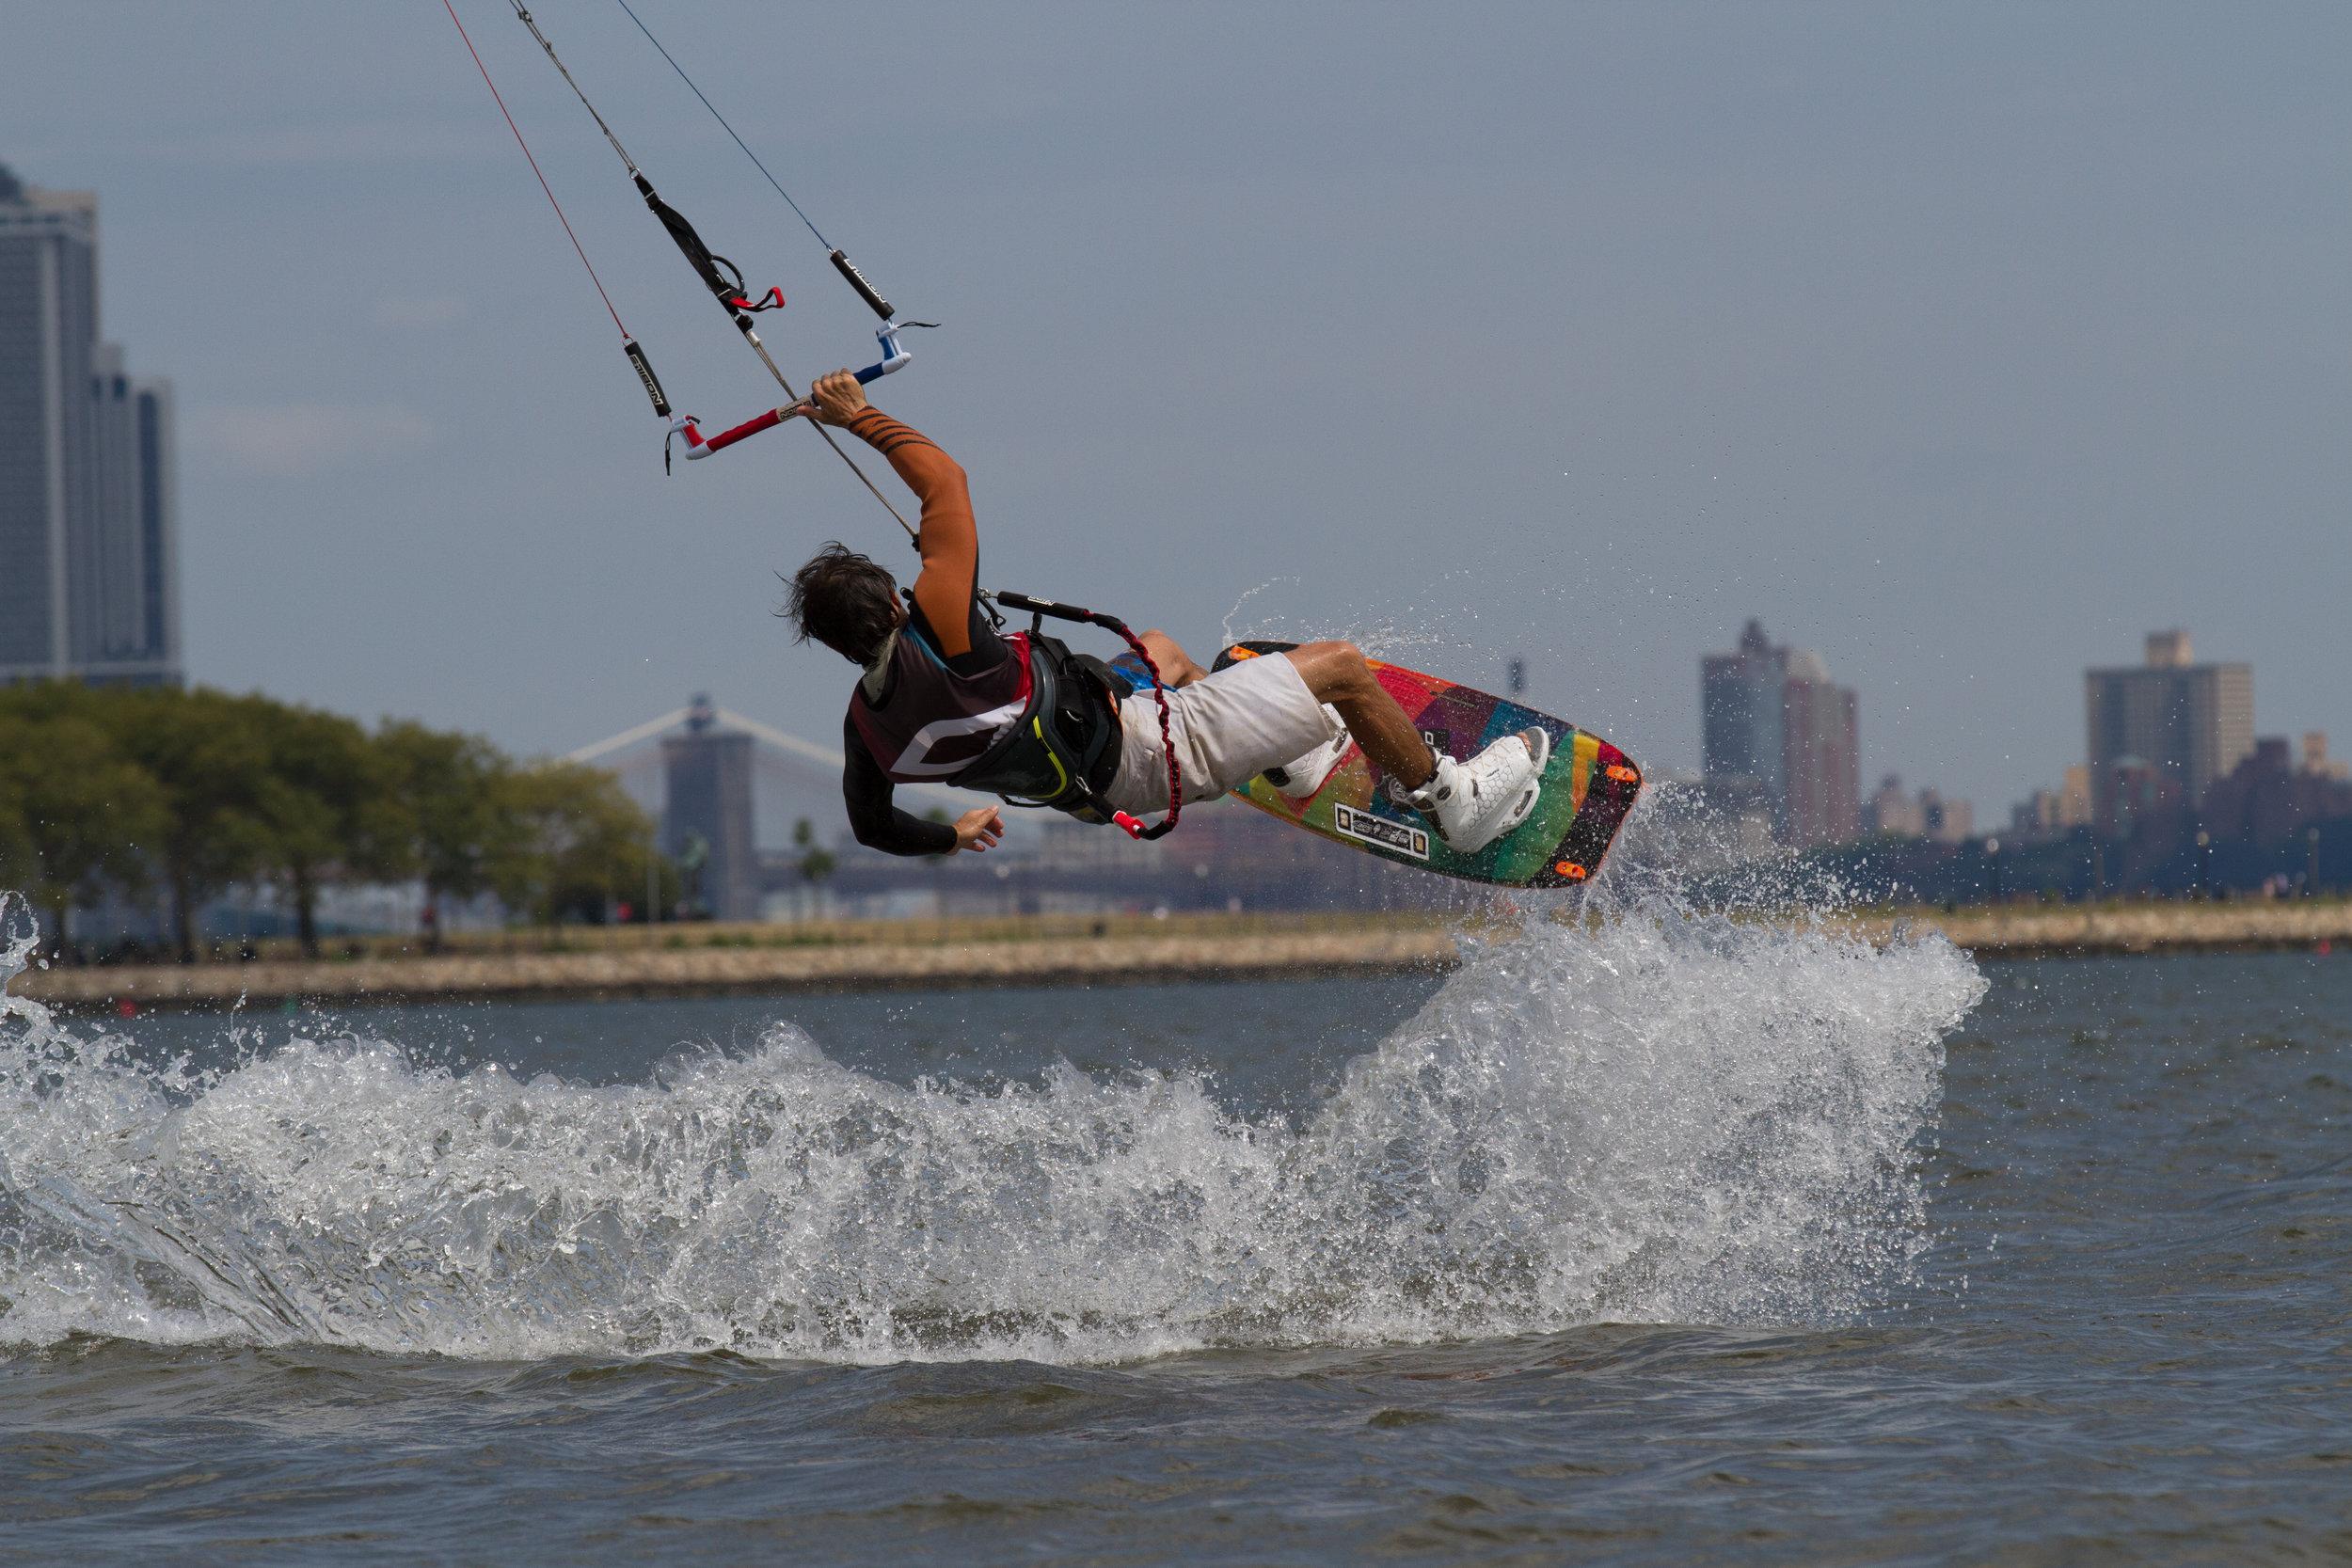 20140821_bjoern_kils_kitesurfing_NYC-2830.jpg